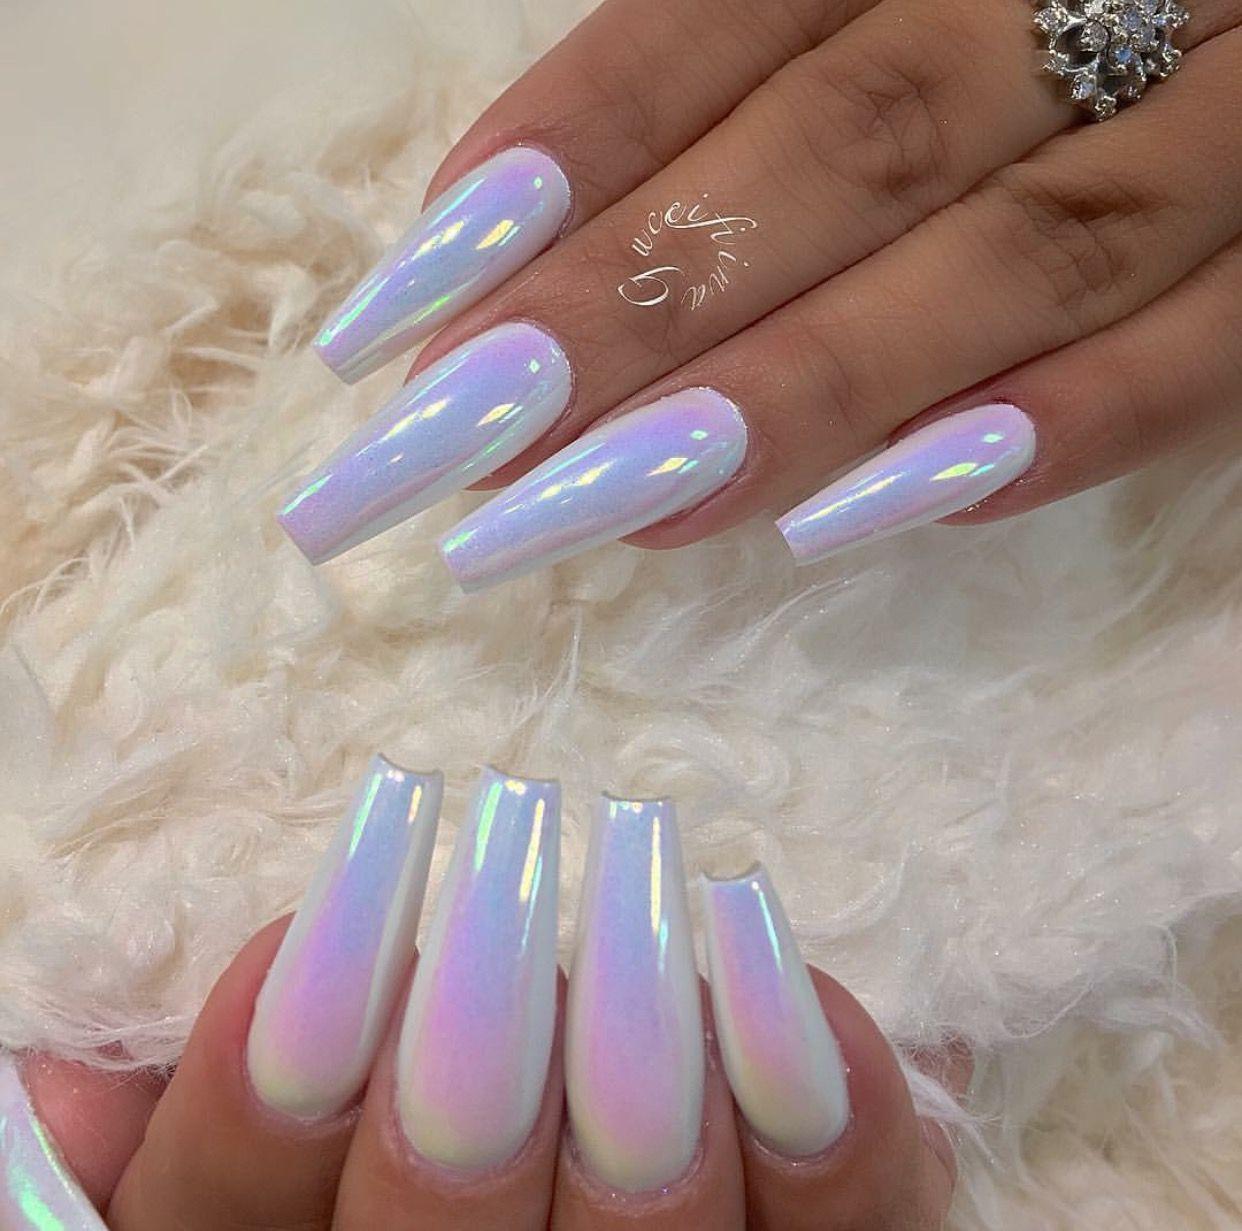 Unicorn Chrome Acrylic Nails Fiina Nail Lounge Unicorn Nails Designs Acrylic Nails Chrome Holographic Nails